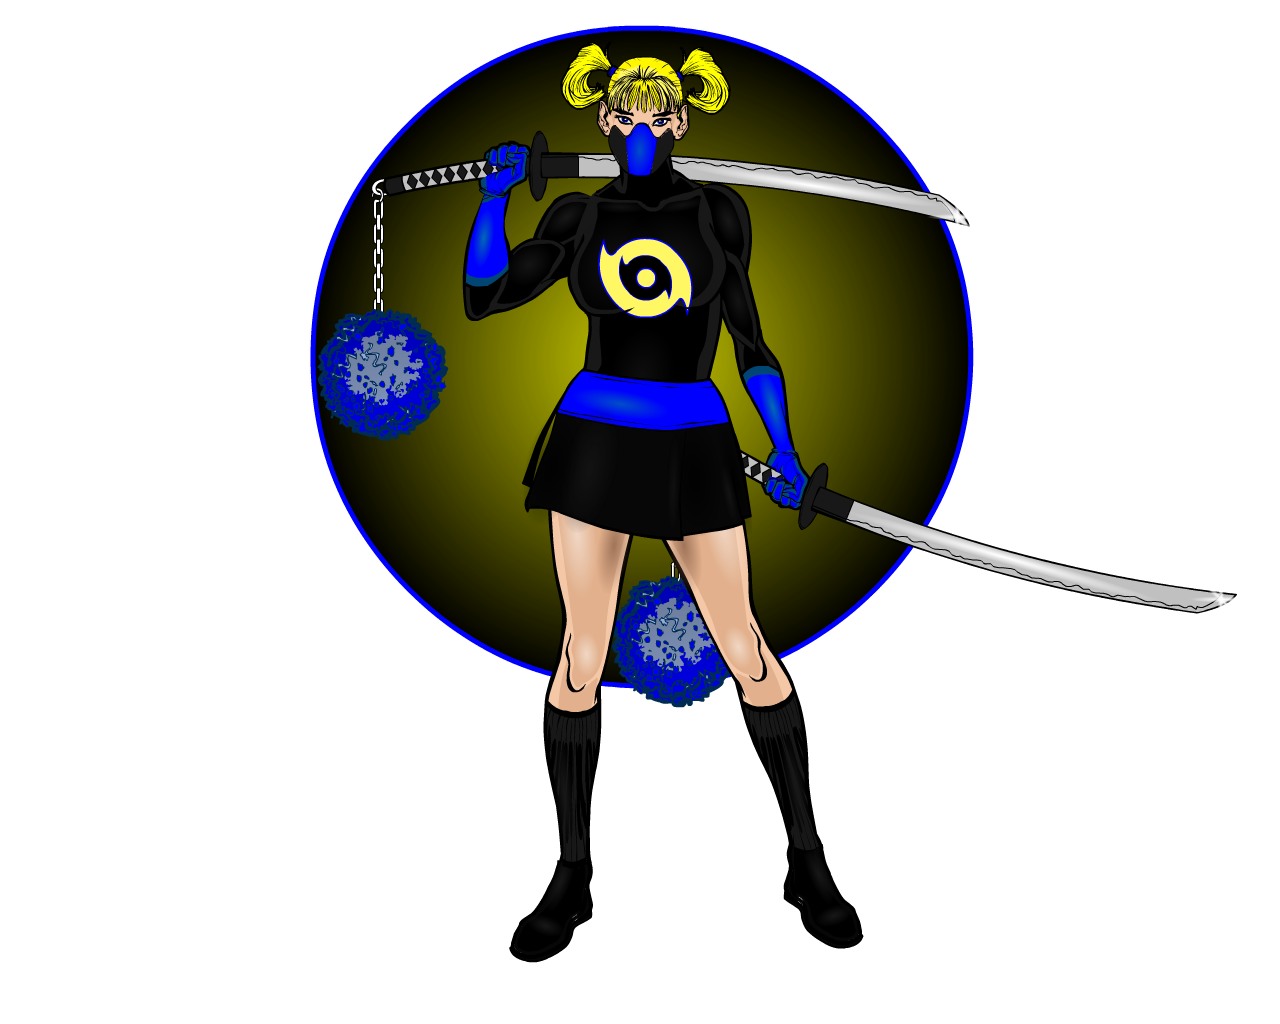 http://www.heromachine.com/wp-content/legacy/forum-image-uploads/headlessgeneral/2012/04/Cheerleader-Ninja.png